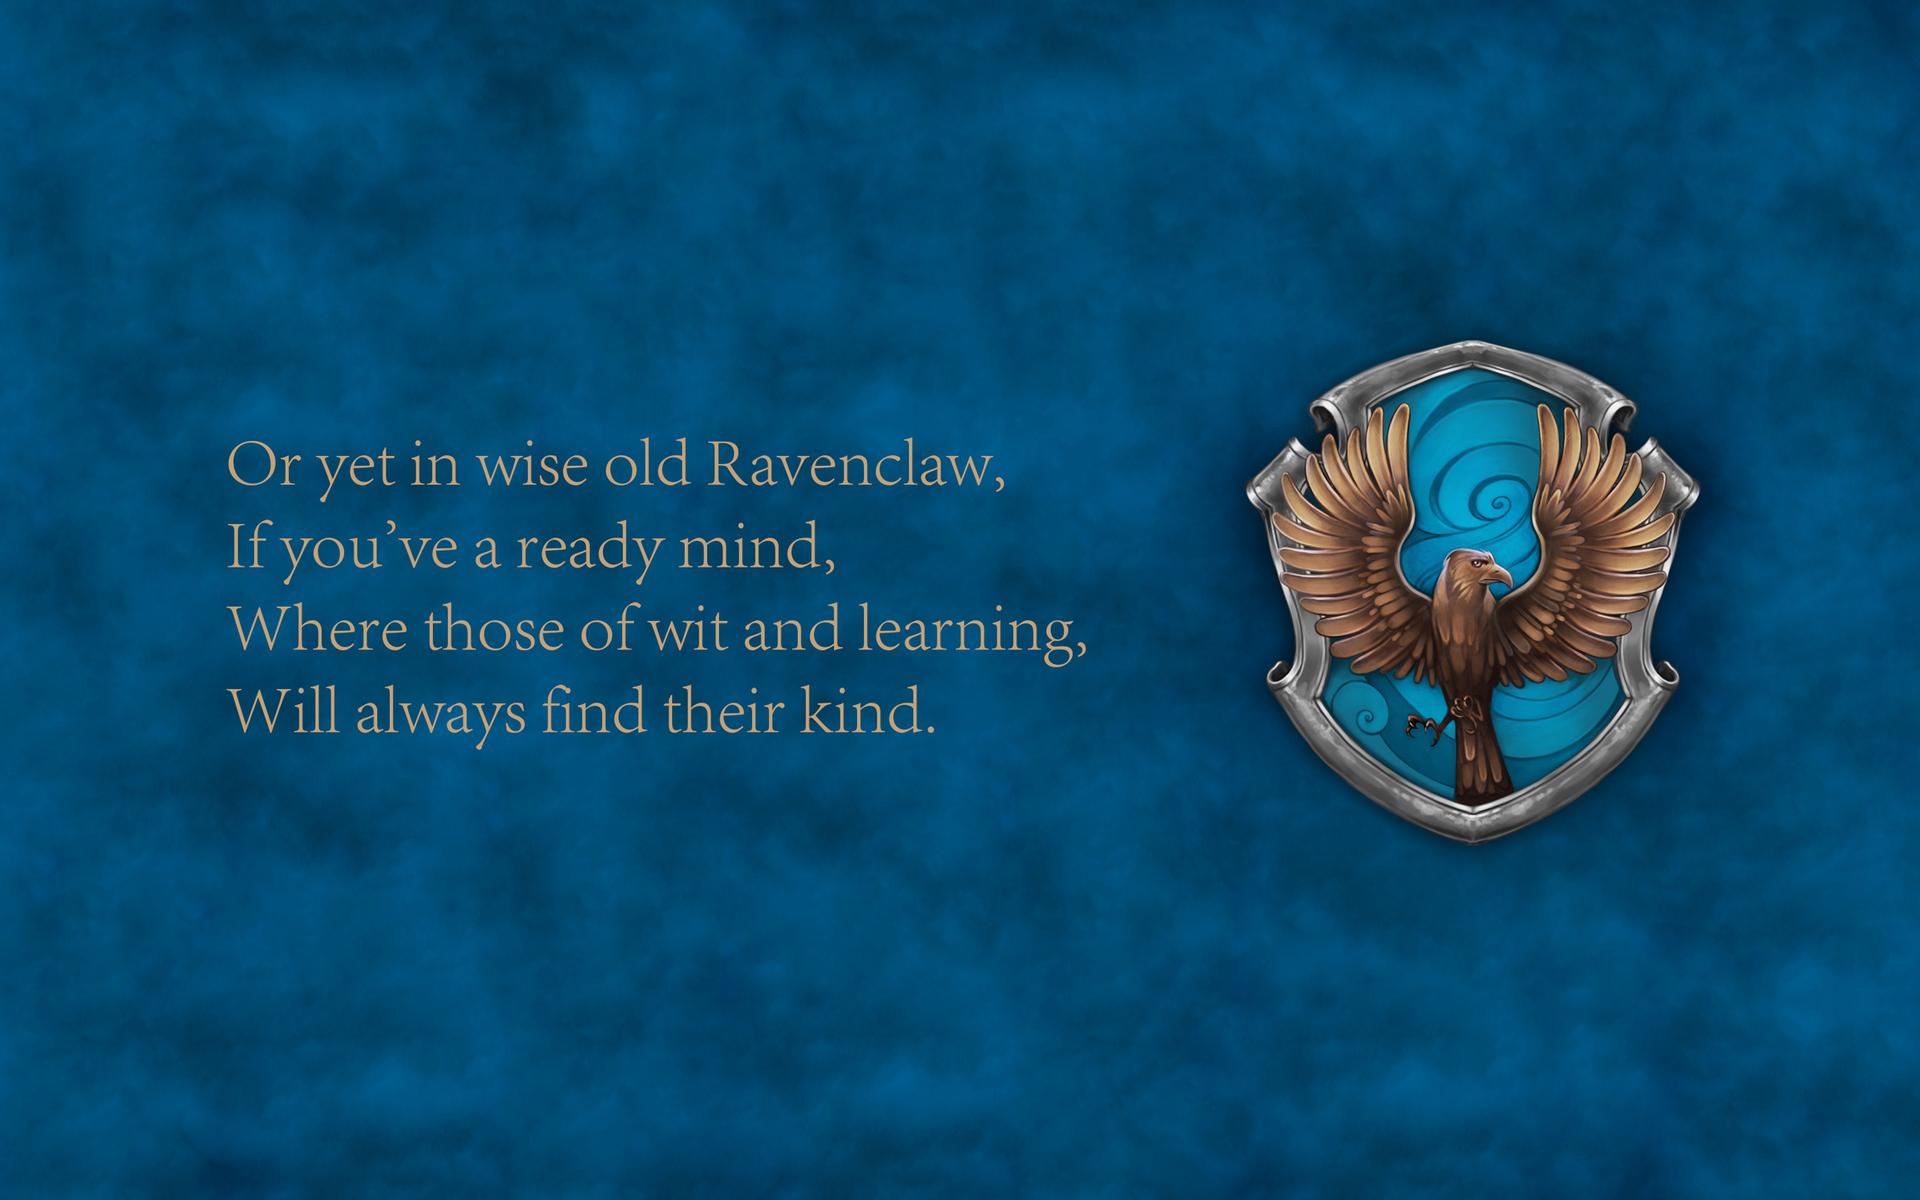 Ravenclaw Wallpaper HD - WallpaperSafari